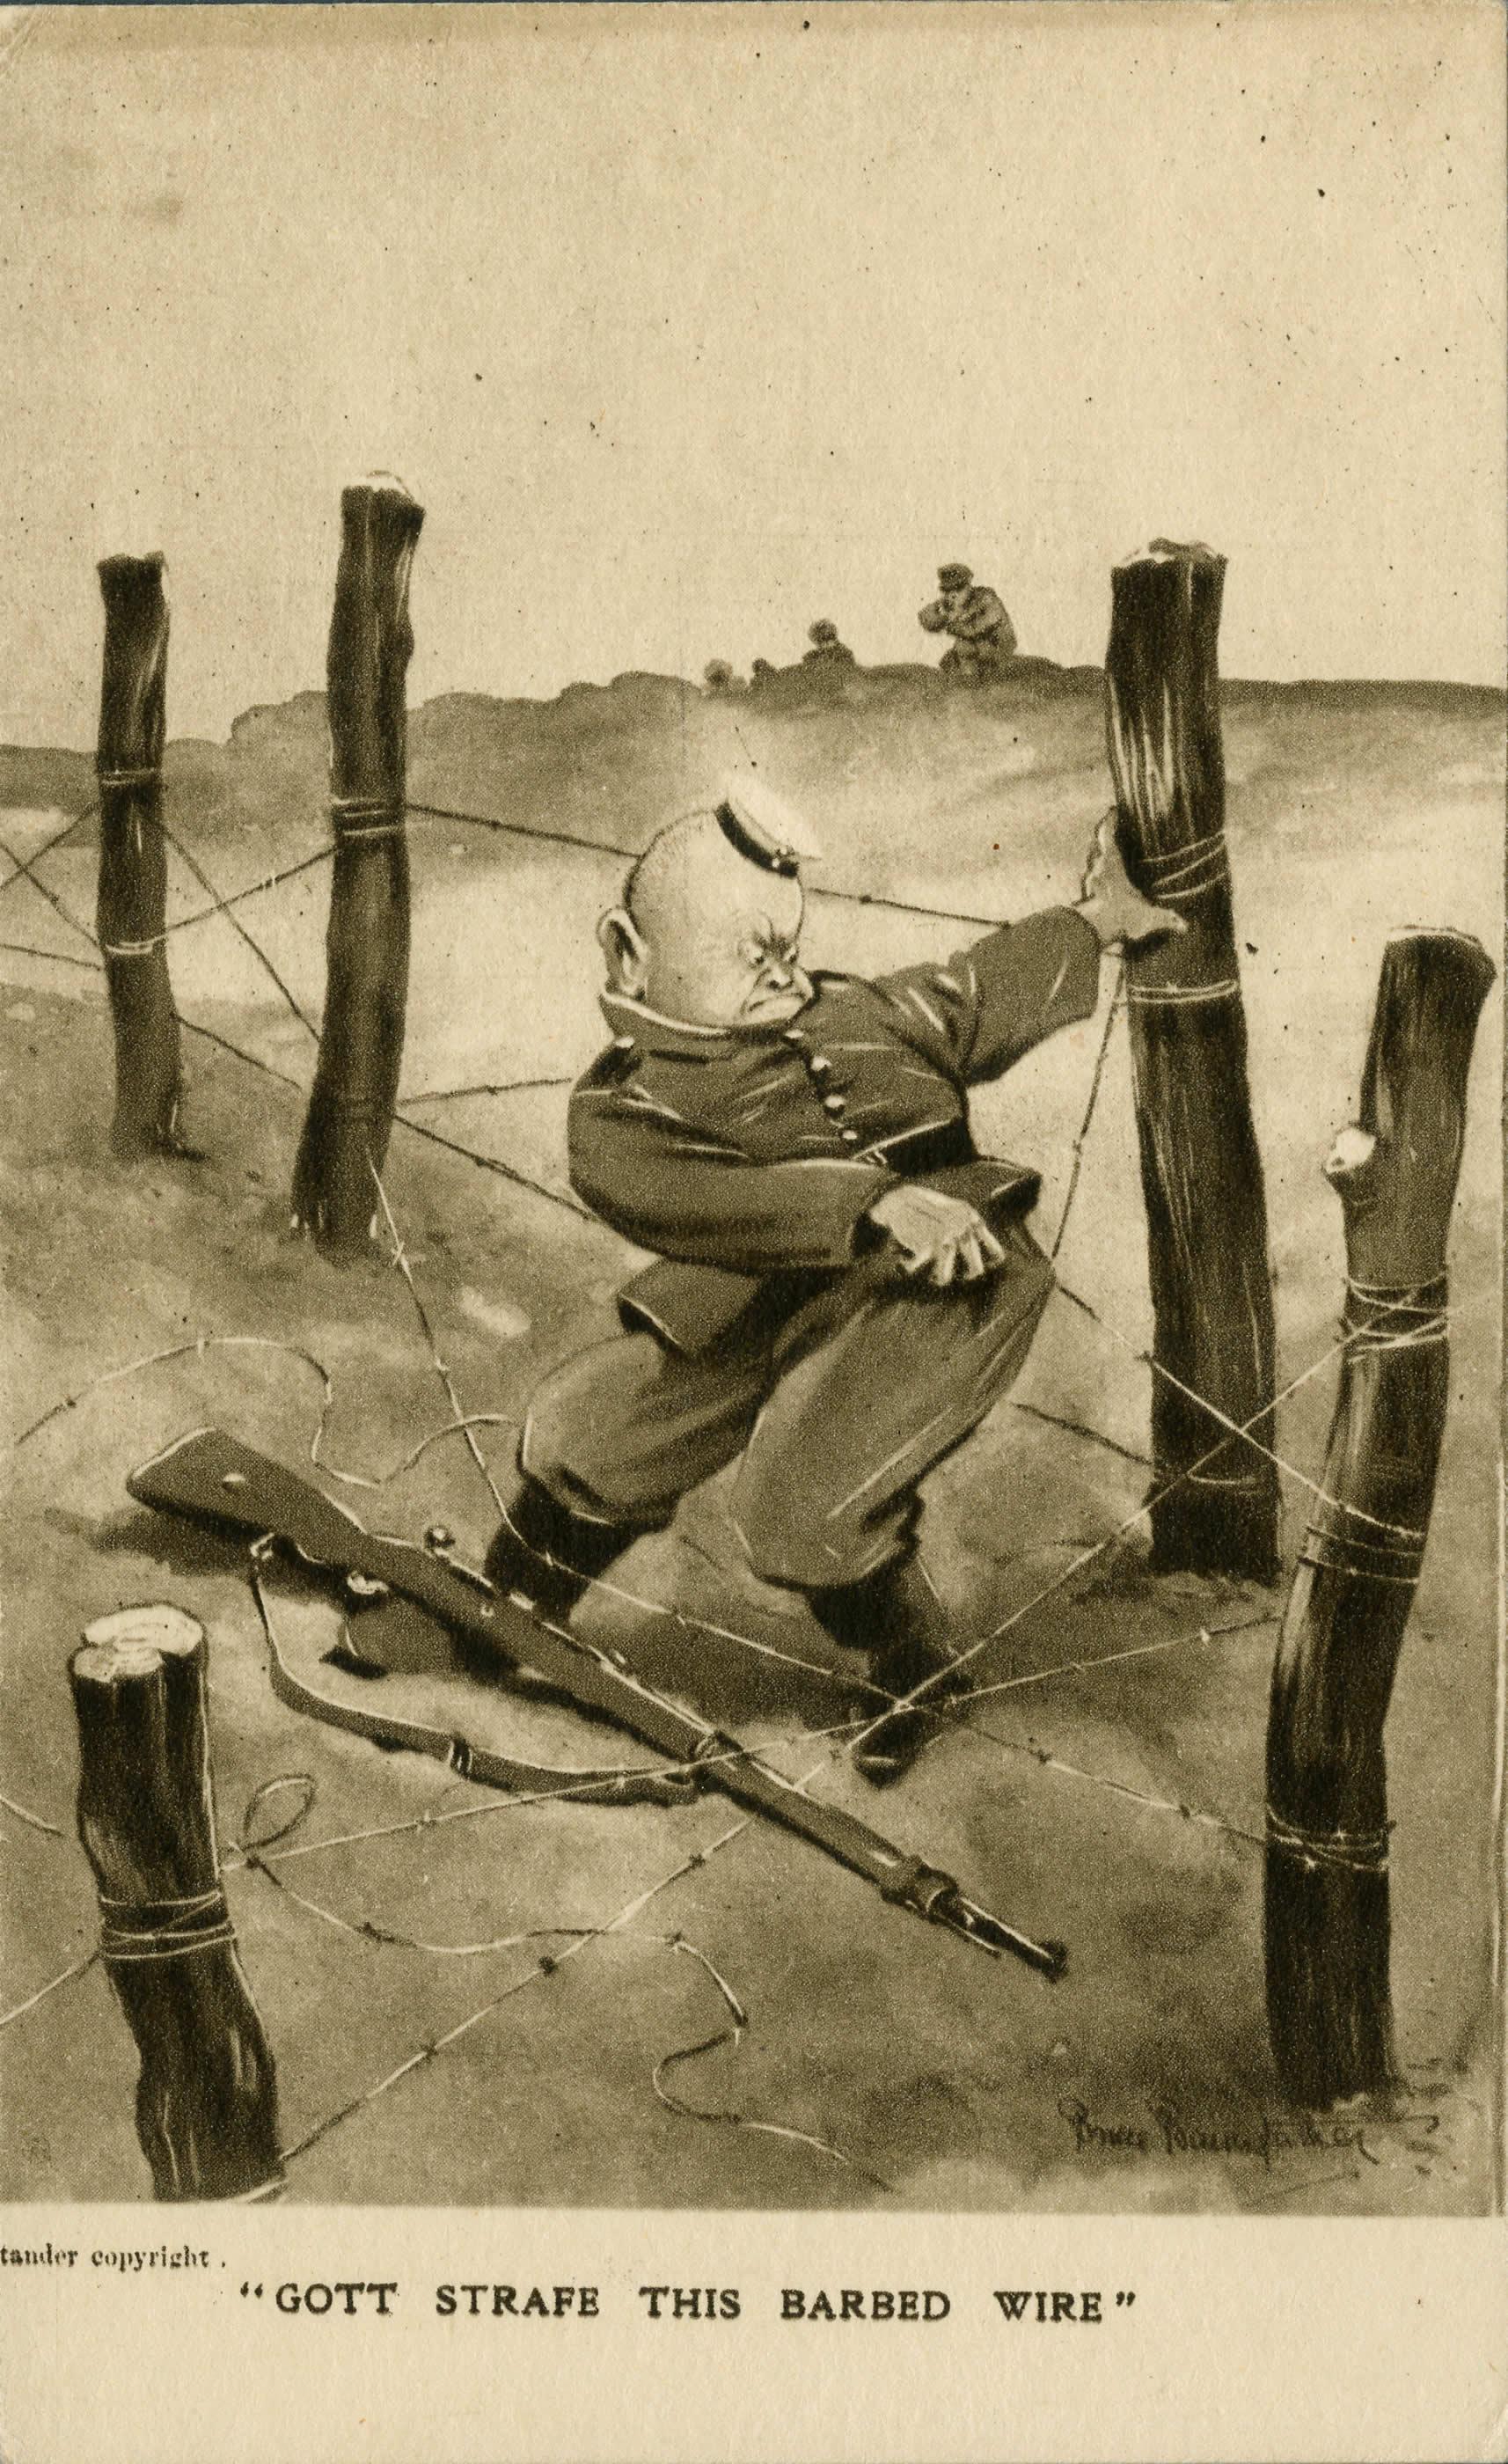 <i>Gott Strafe This Barbed Wire (Gott Strafe ces barbelés)</i>